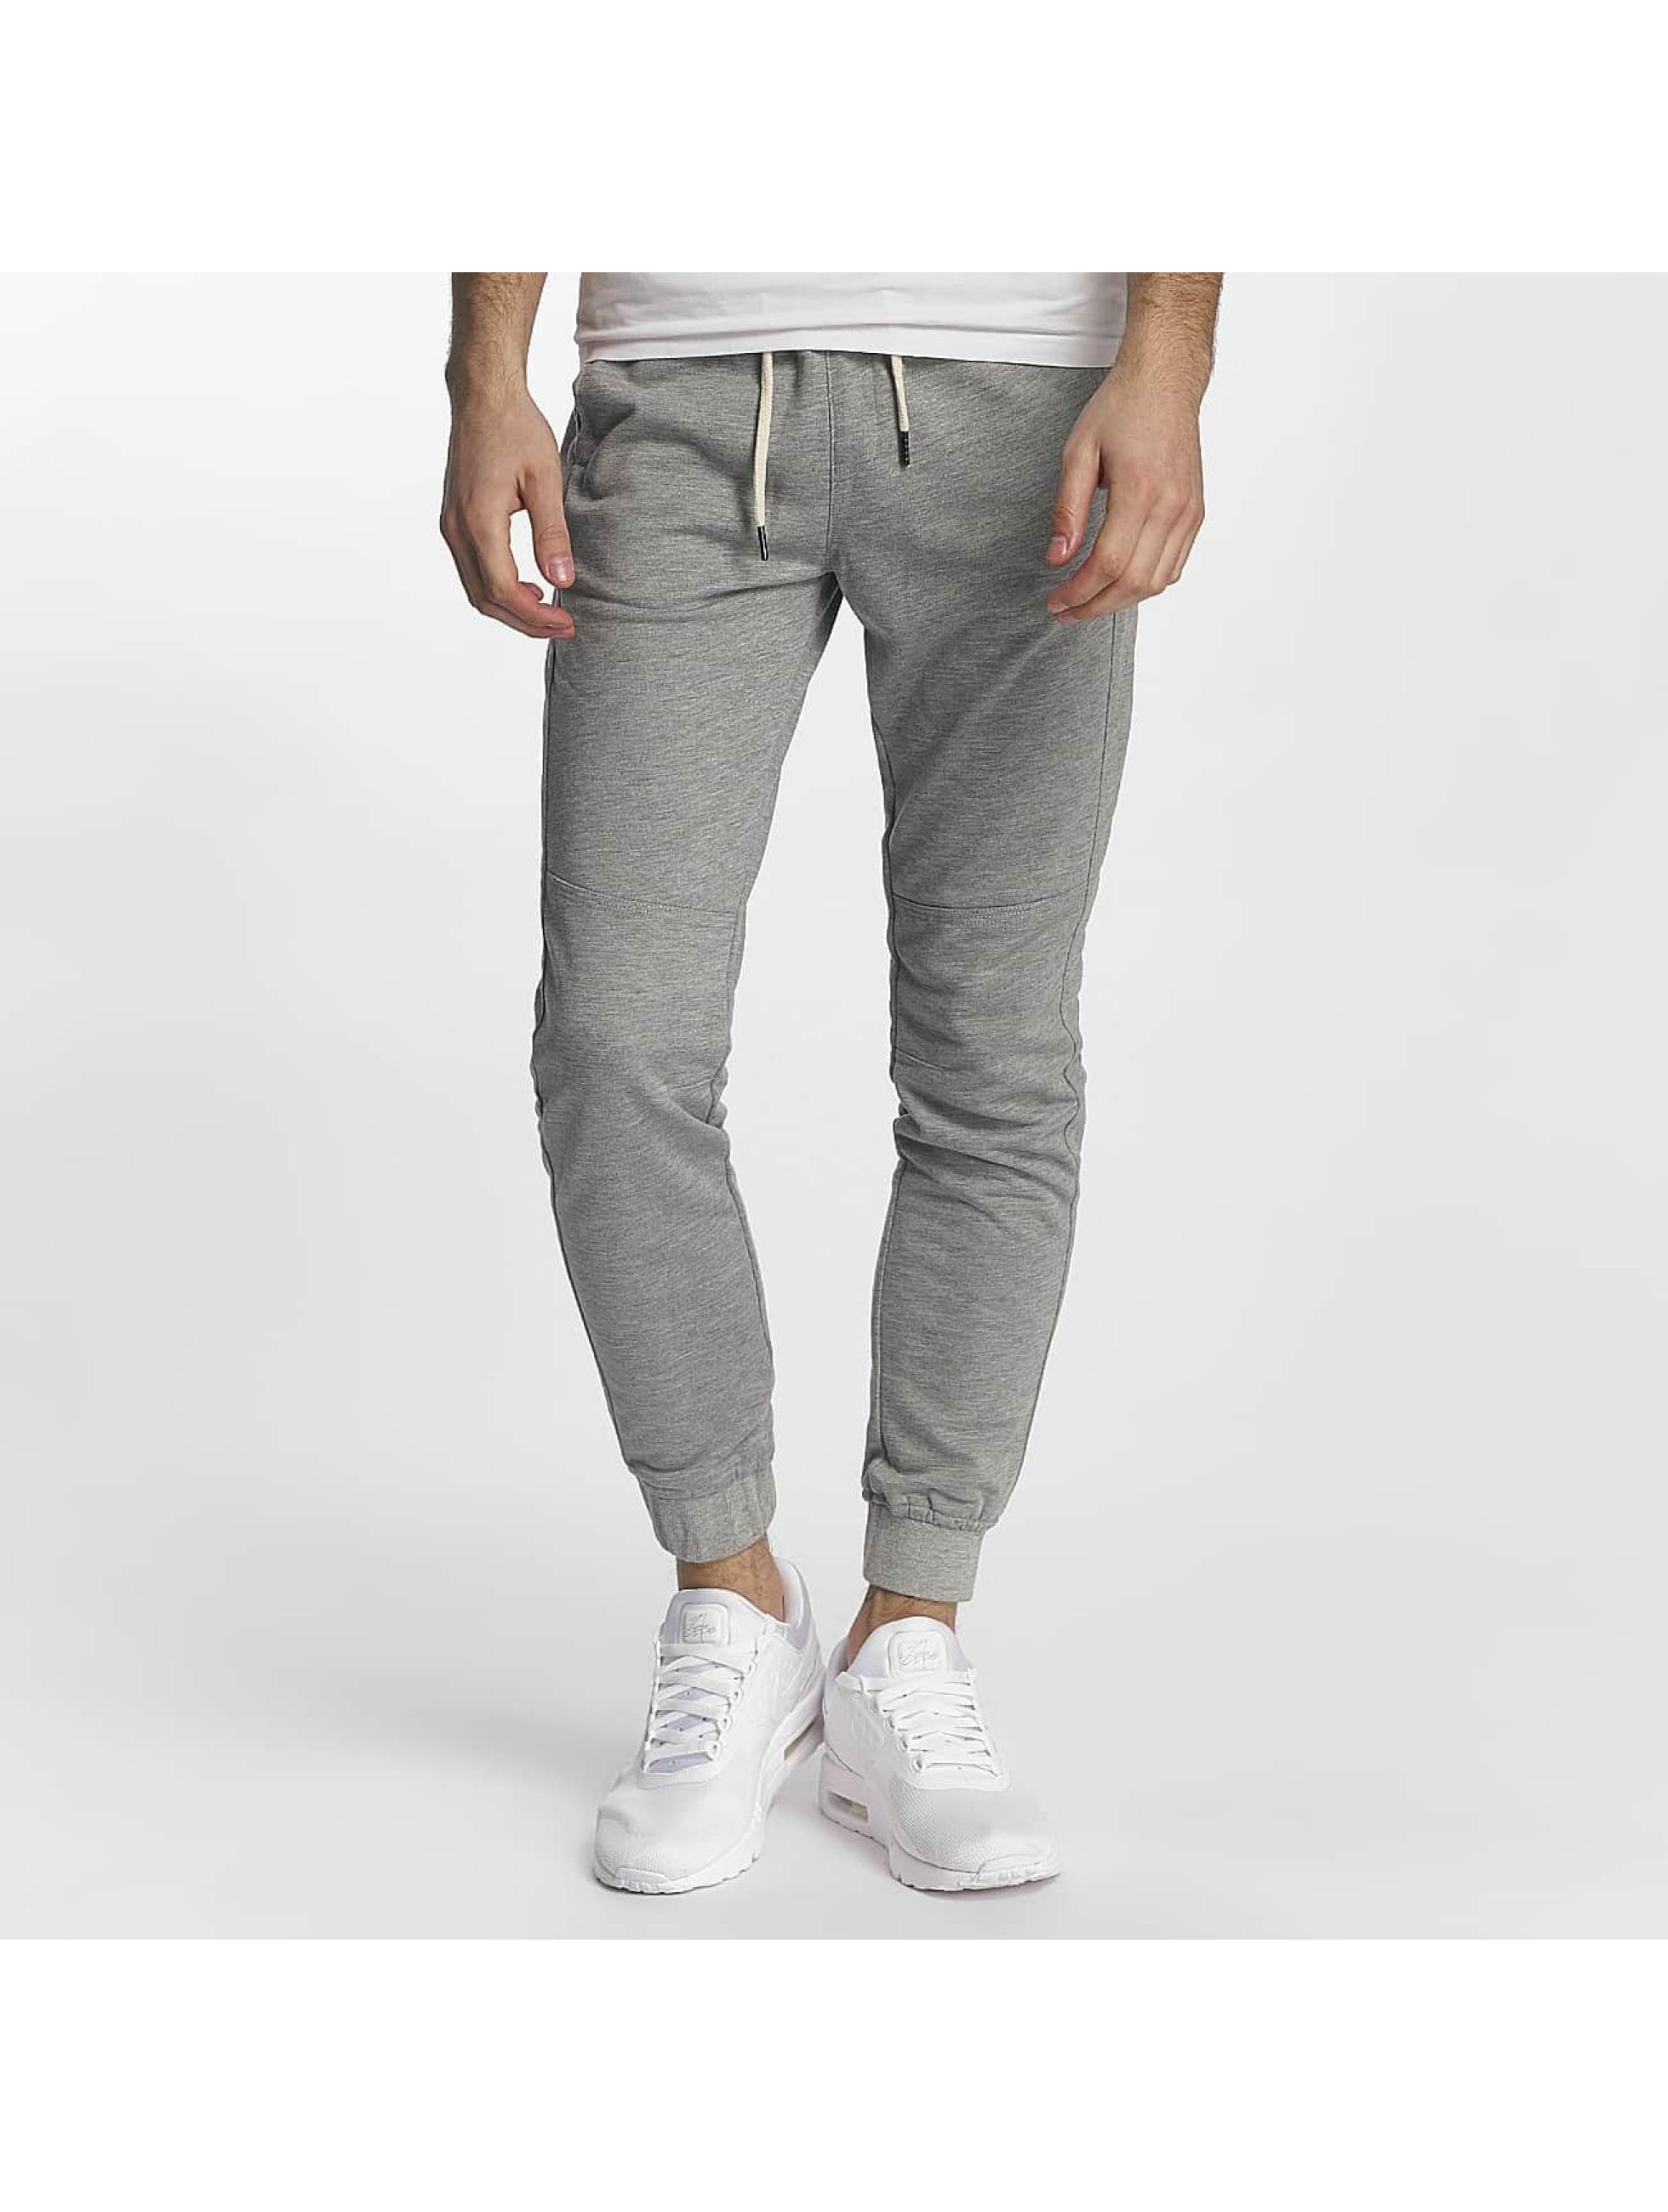 TrueSpin Spodnie do joggingu TS Jogger szary